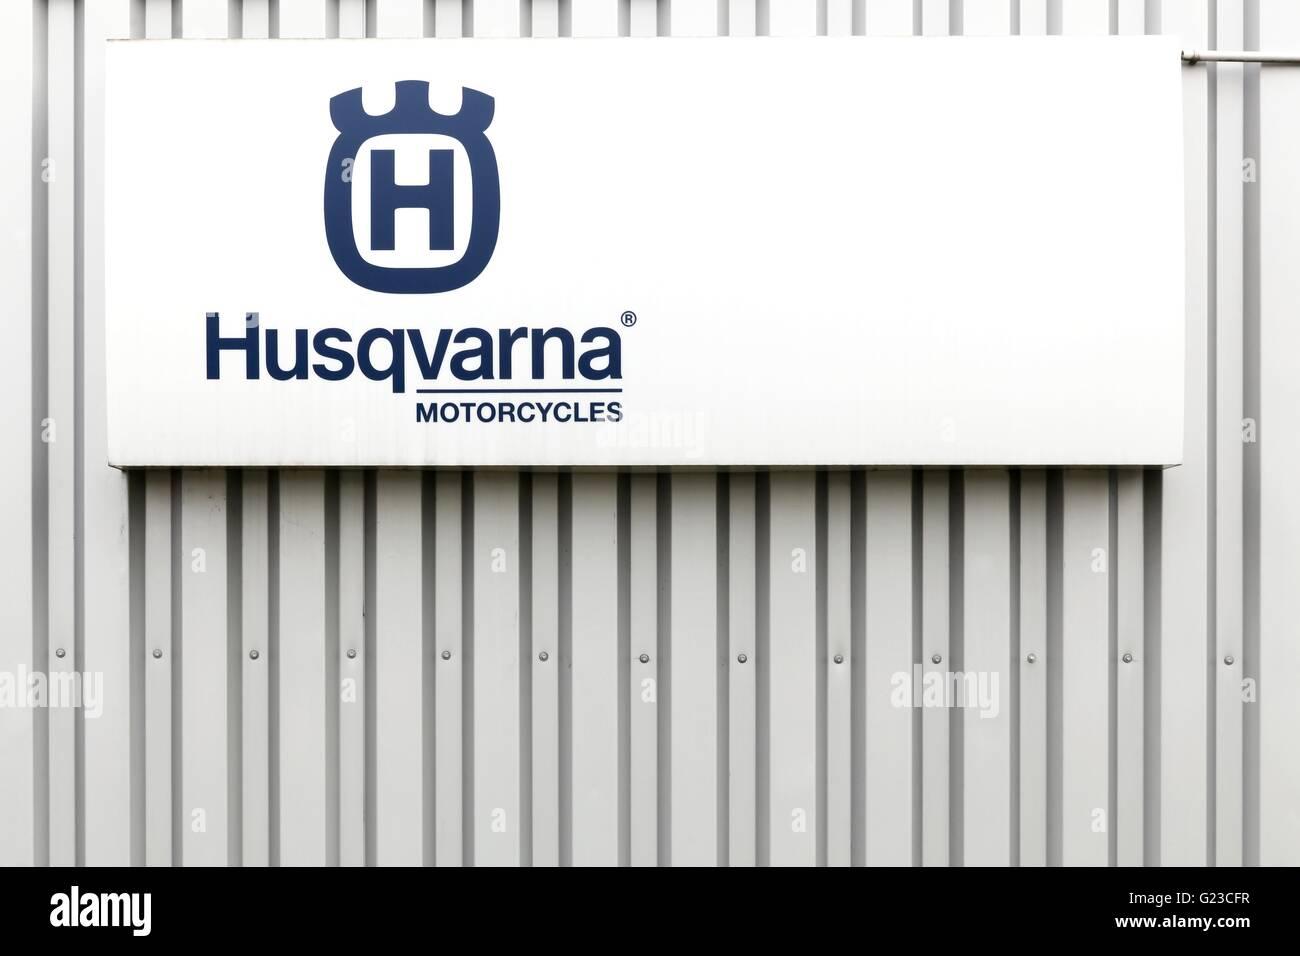 Husqvarna  motorcycles logo on a facade - Stock Image